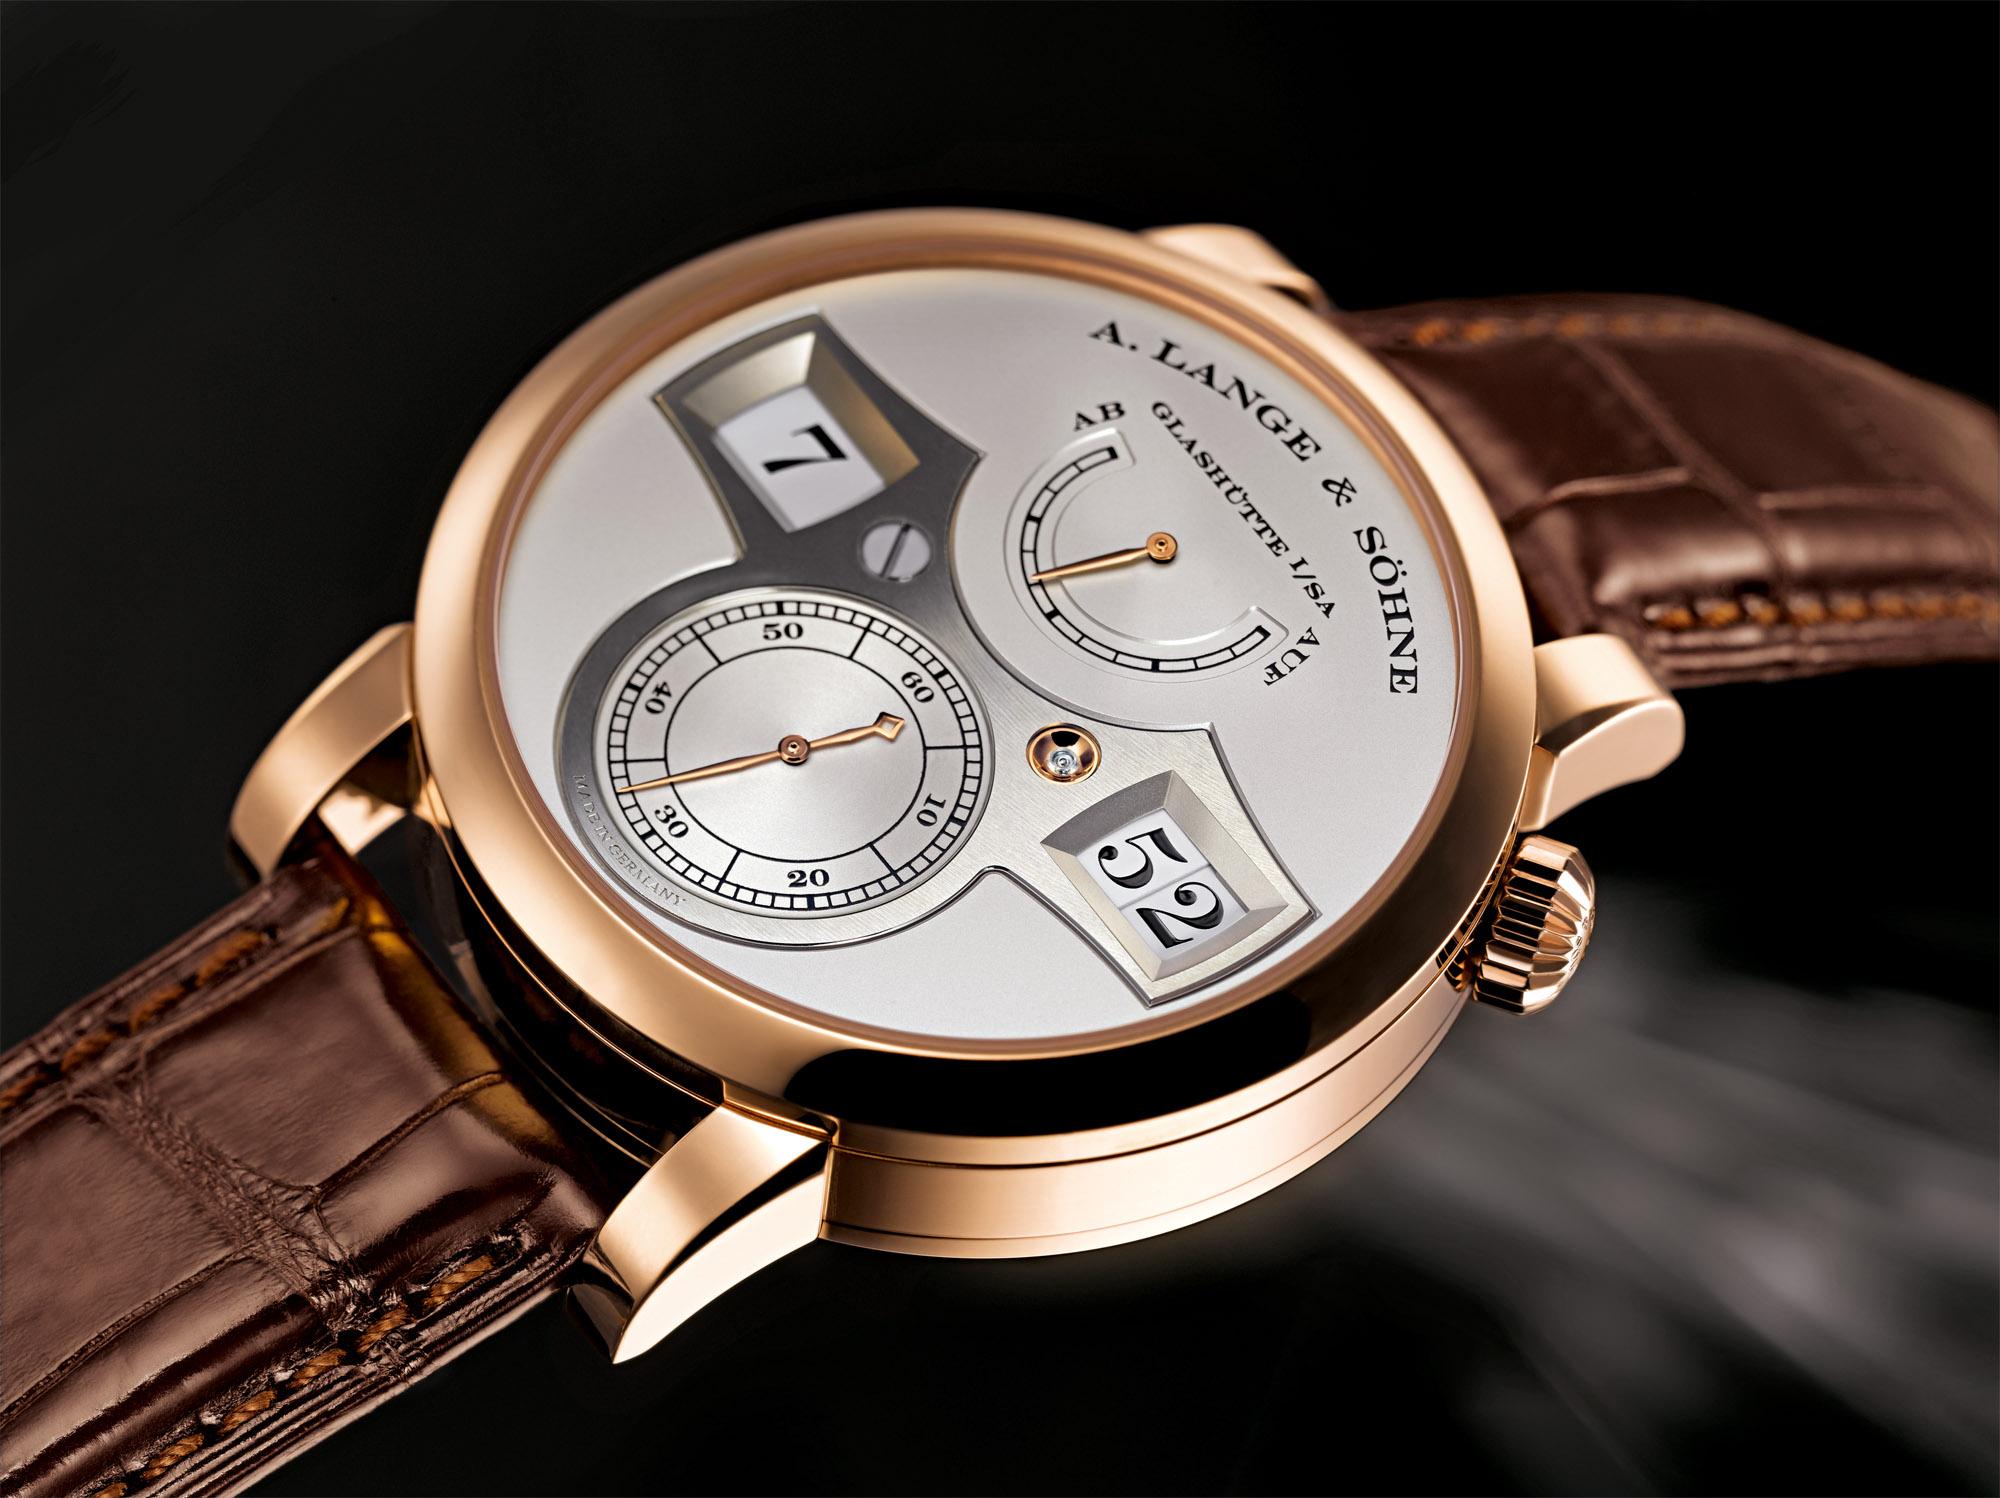 A. Lange & Söhne Zeitwerk (Solid Silver Dial)